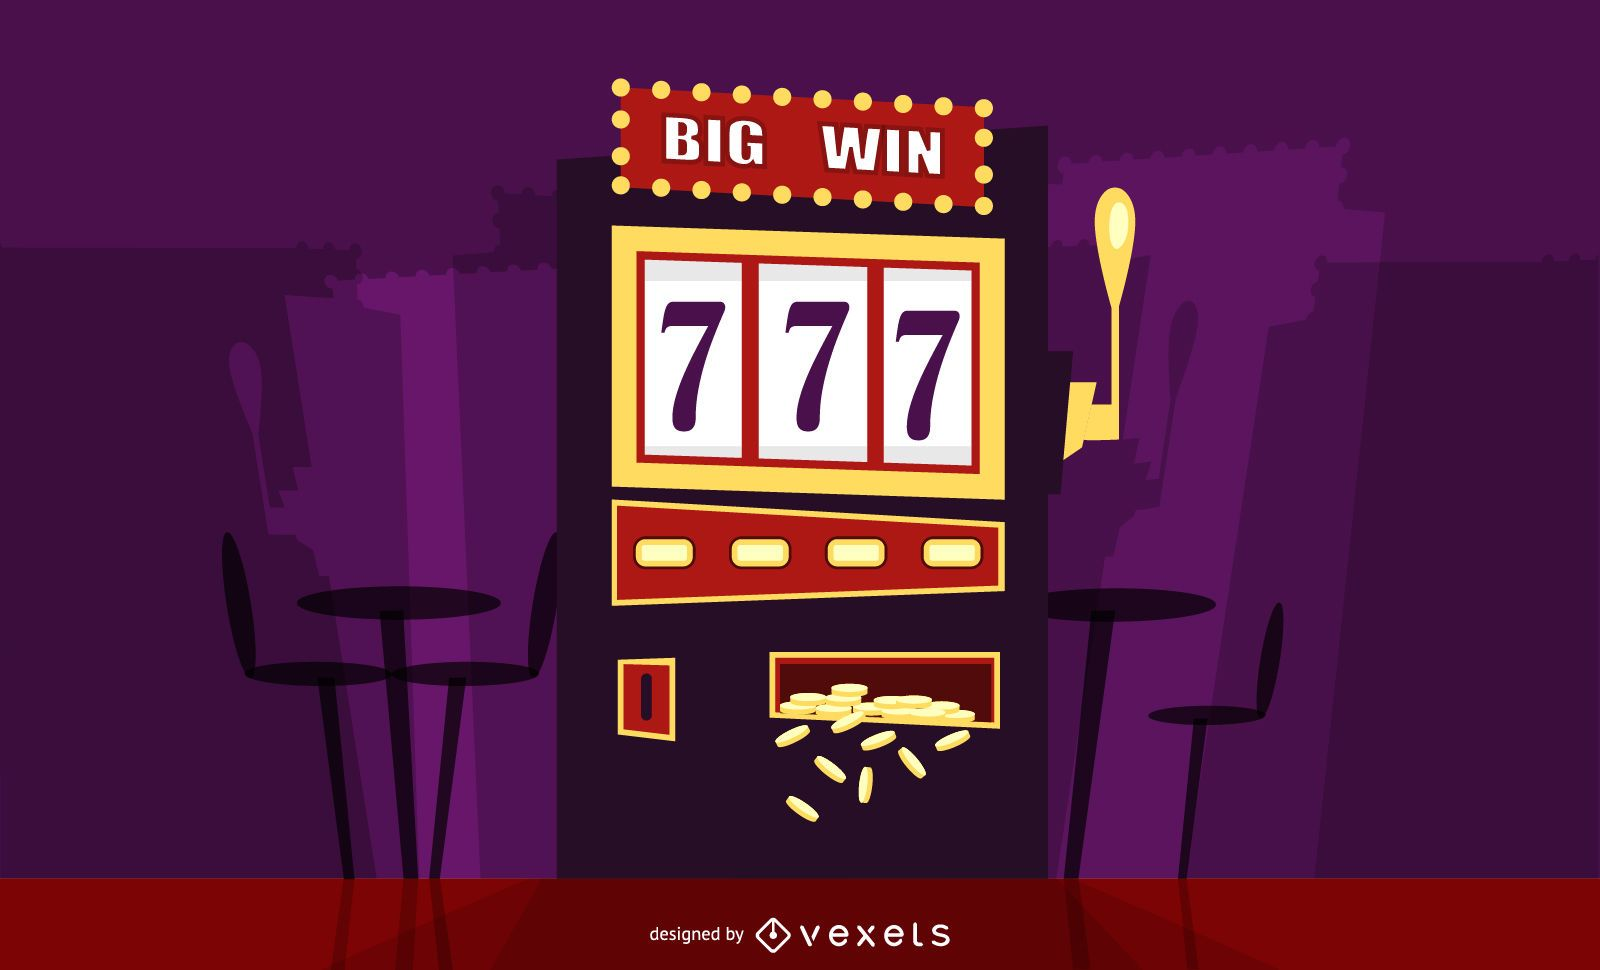 Big win slot illustration